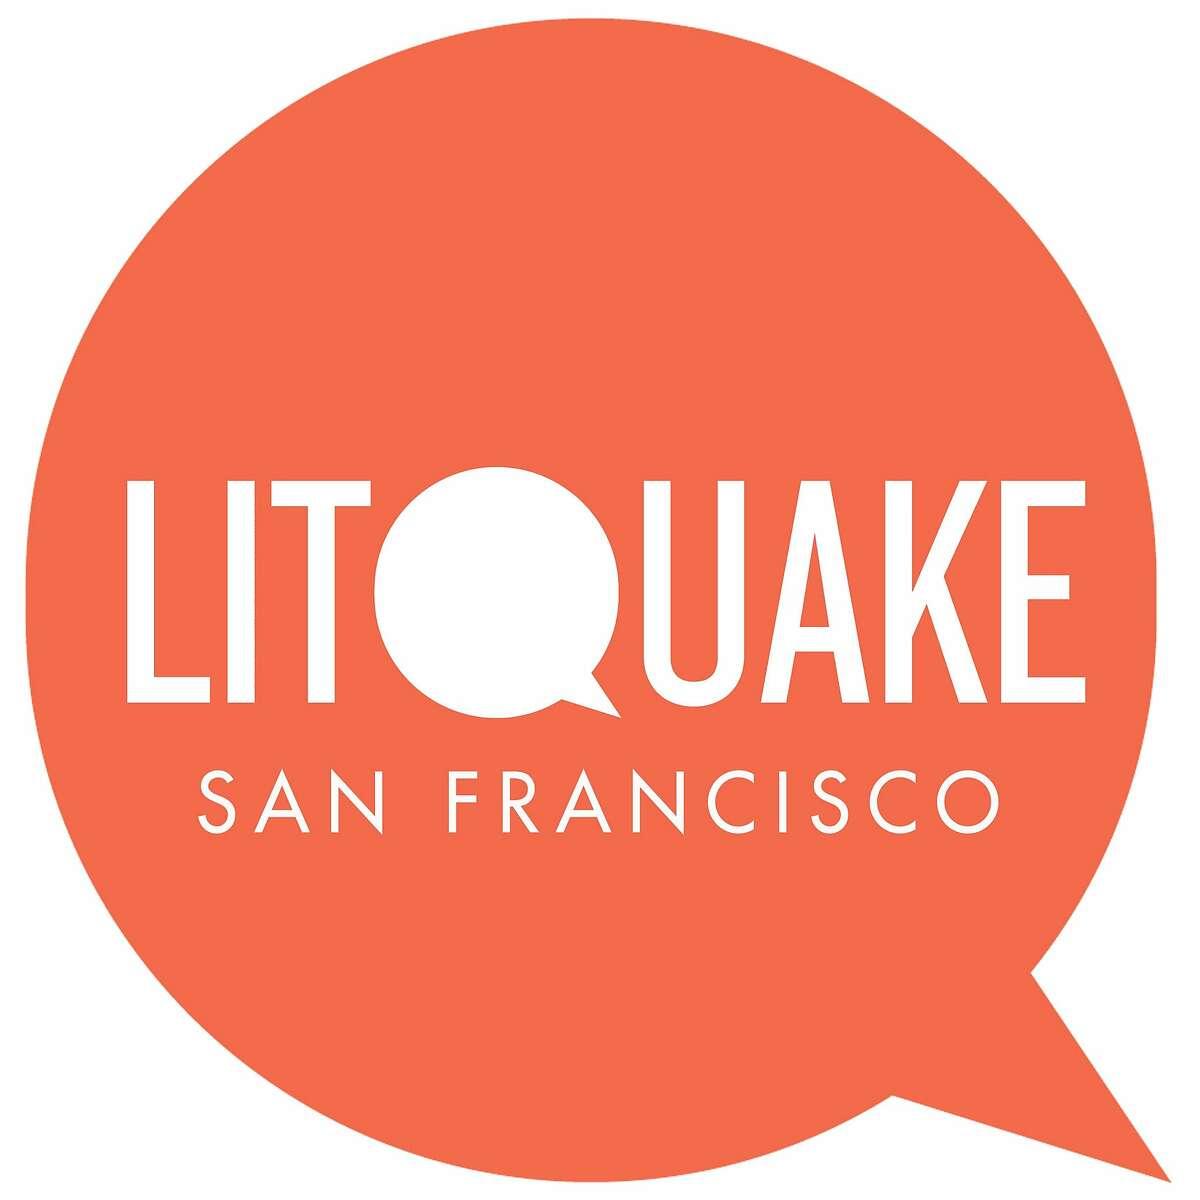 Litquake runs Oct. 6-14.